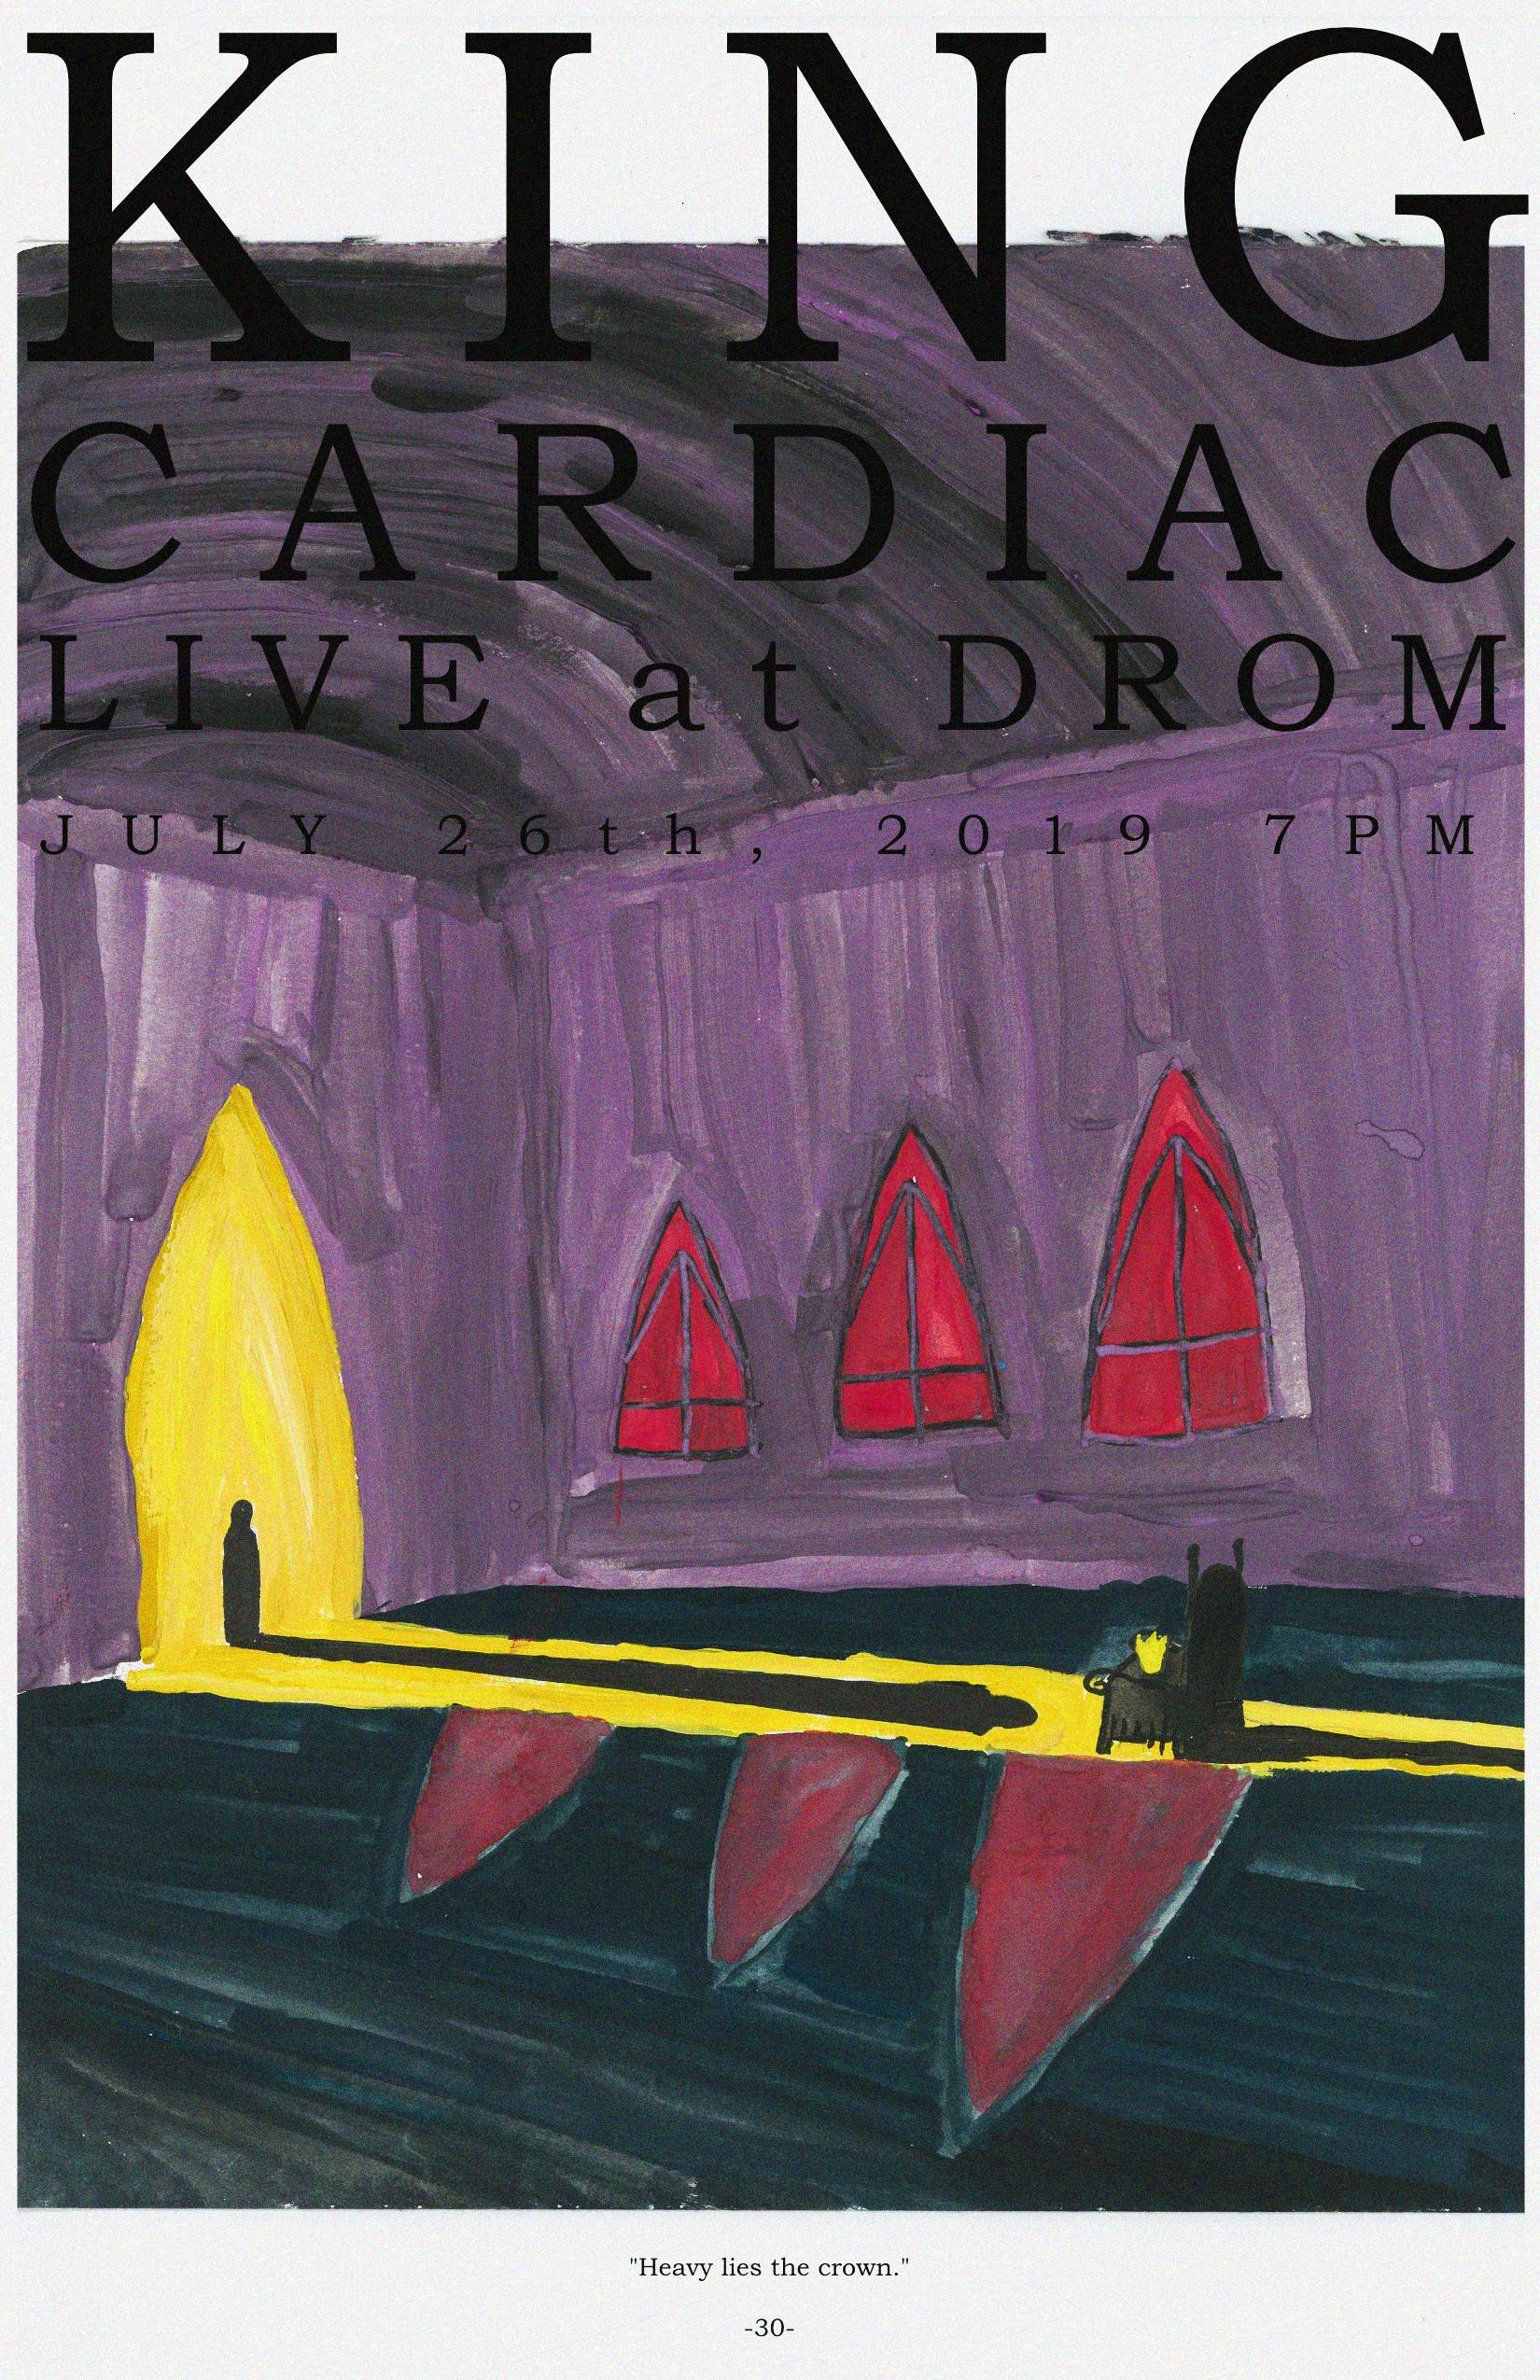 King Cardiac at DROM - JULY 26th, 2019 7PM